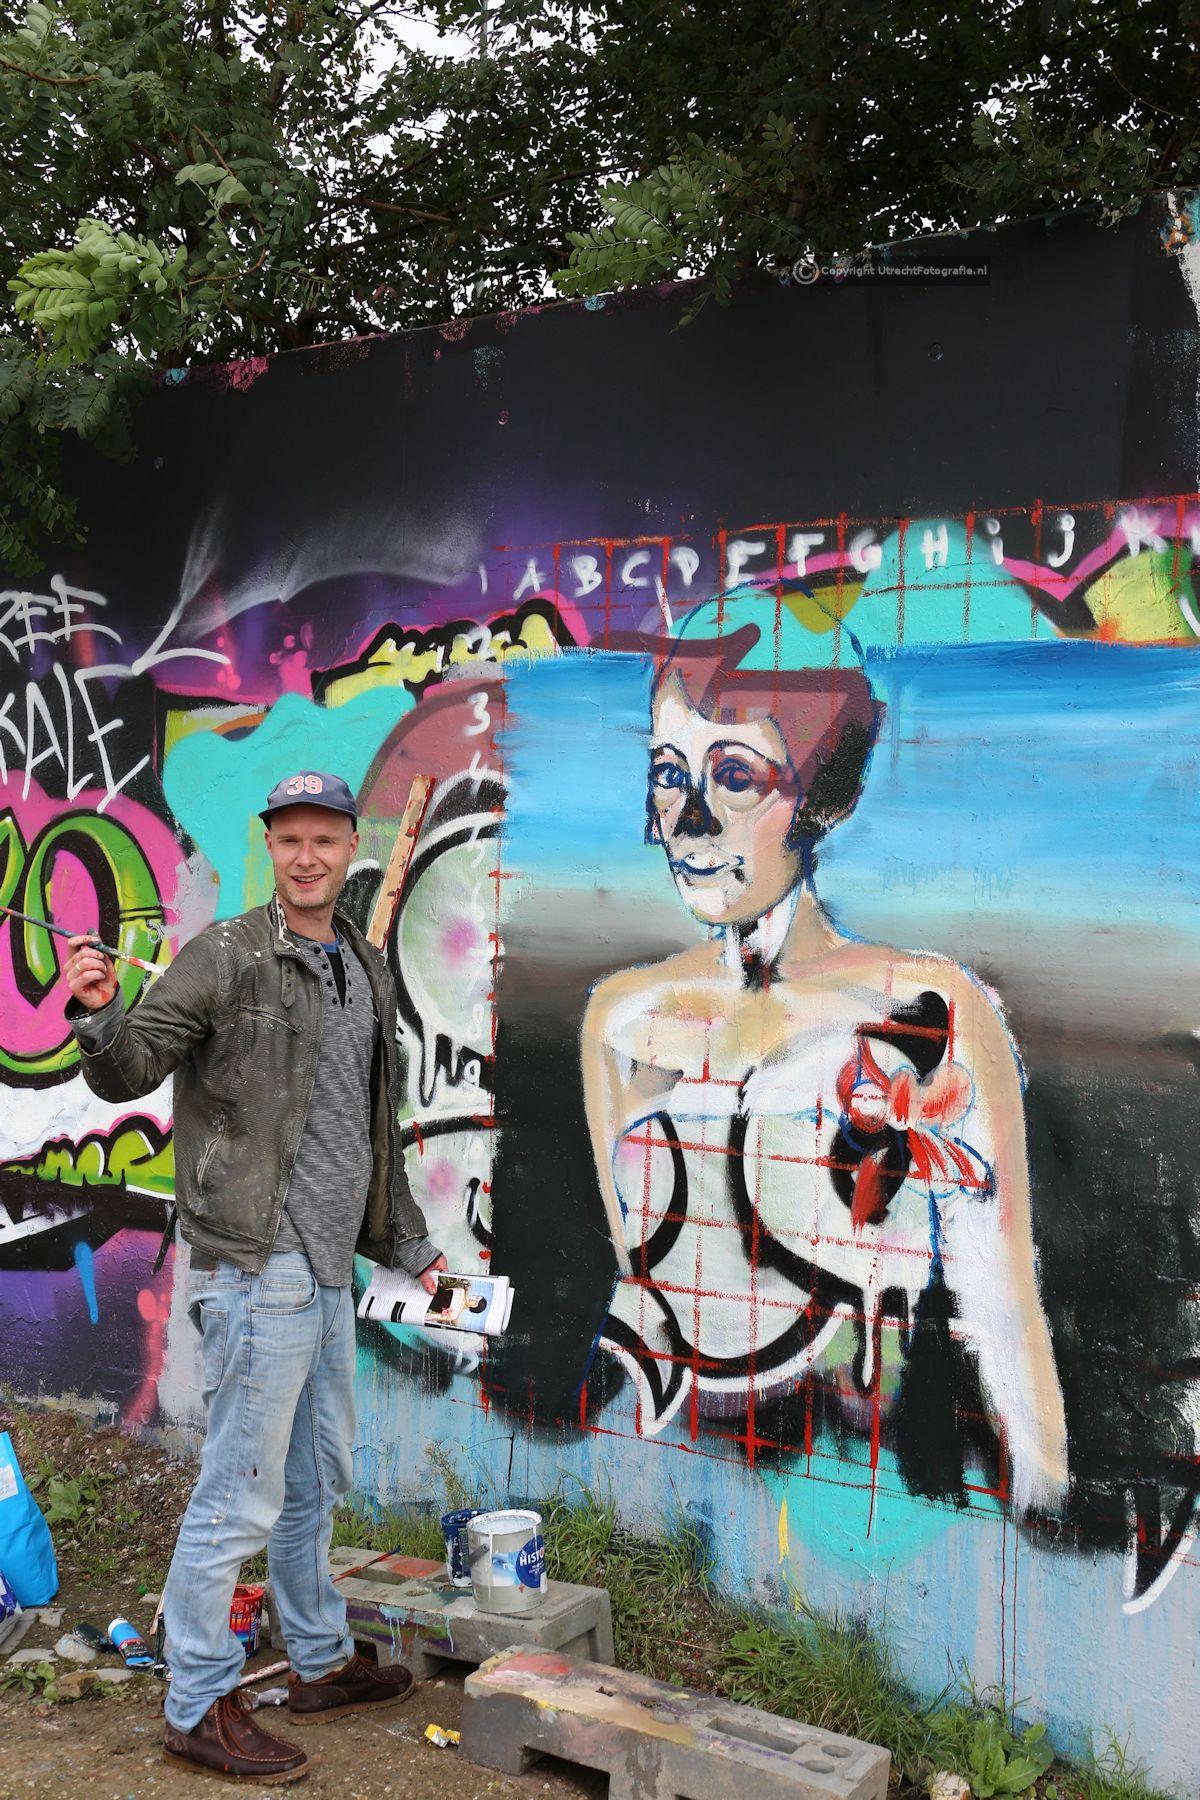 20170910 Graffitigebied 6